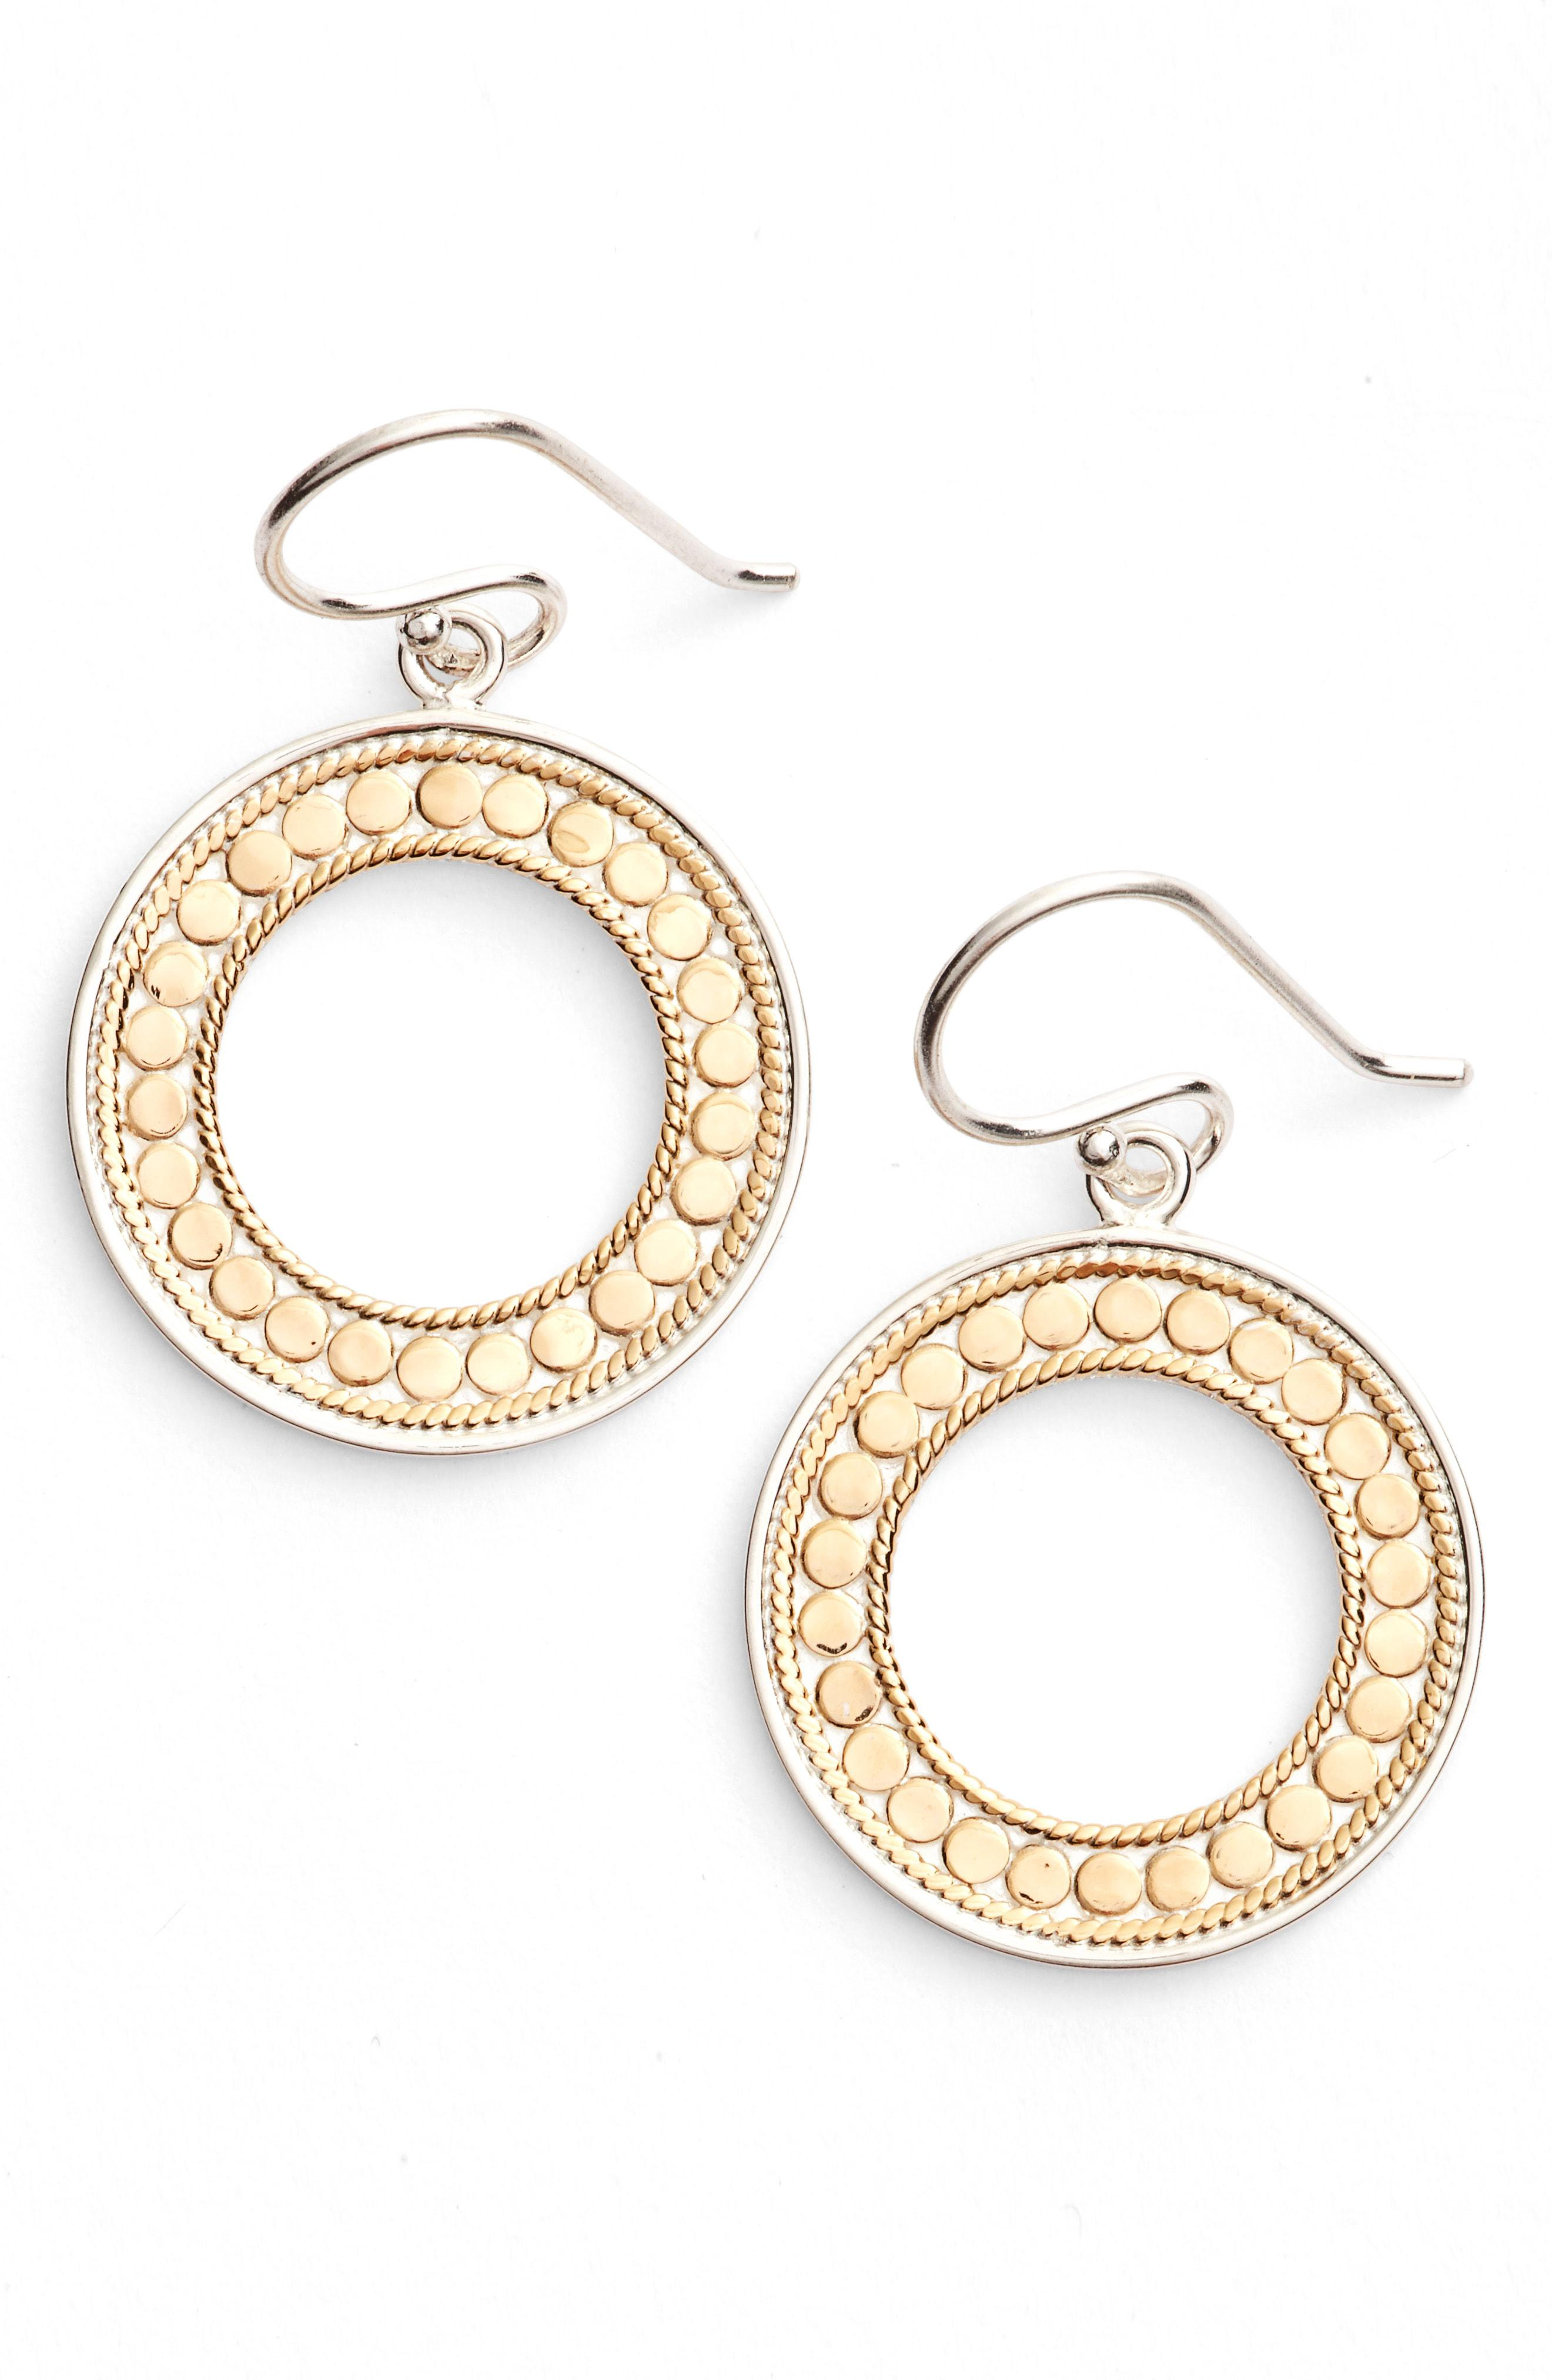 aaf25b377 Lyst - Anna Beck Open Circle Drop Earrings in Metallic